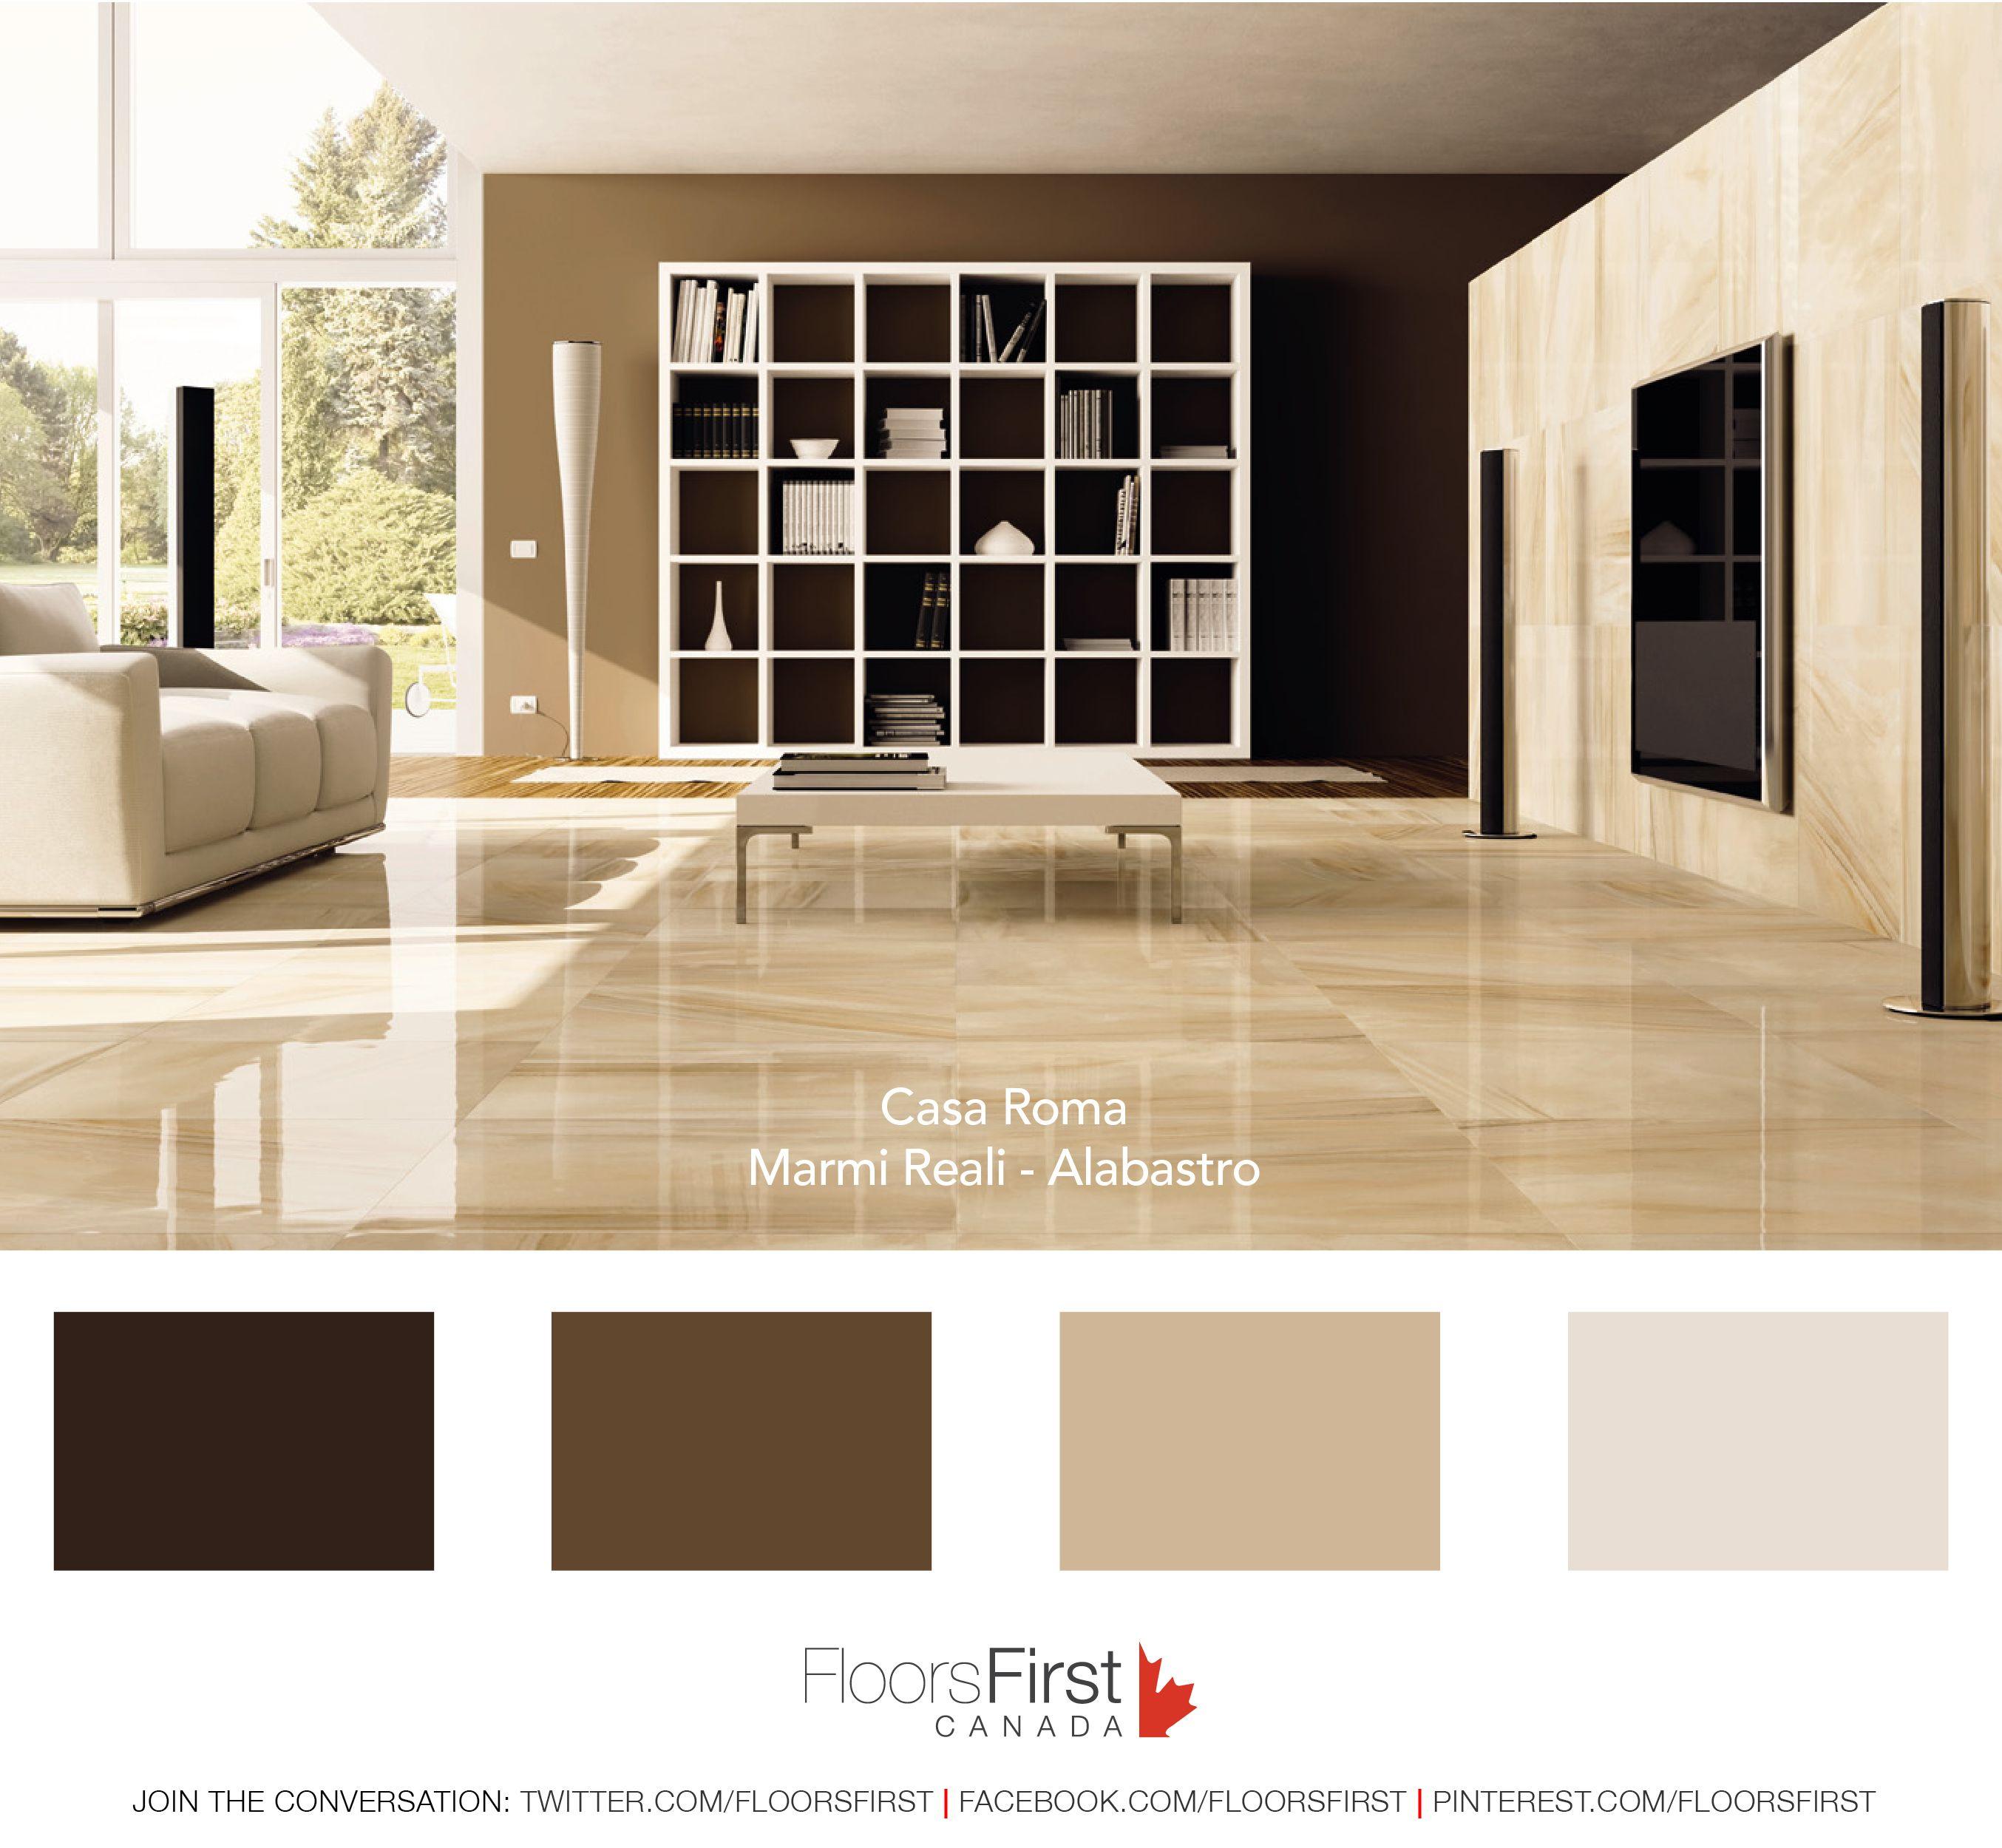 Floor Tile Decor Casa Roma Marmi Reali Series Floor Tile  Design It  Floor Tile